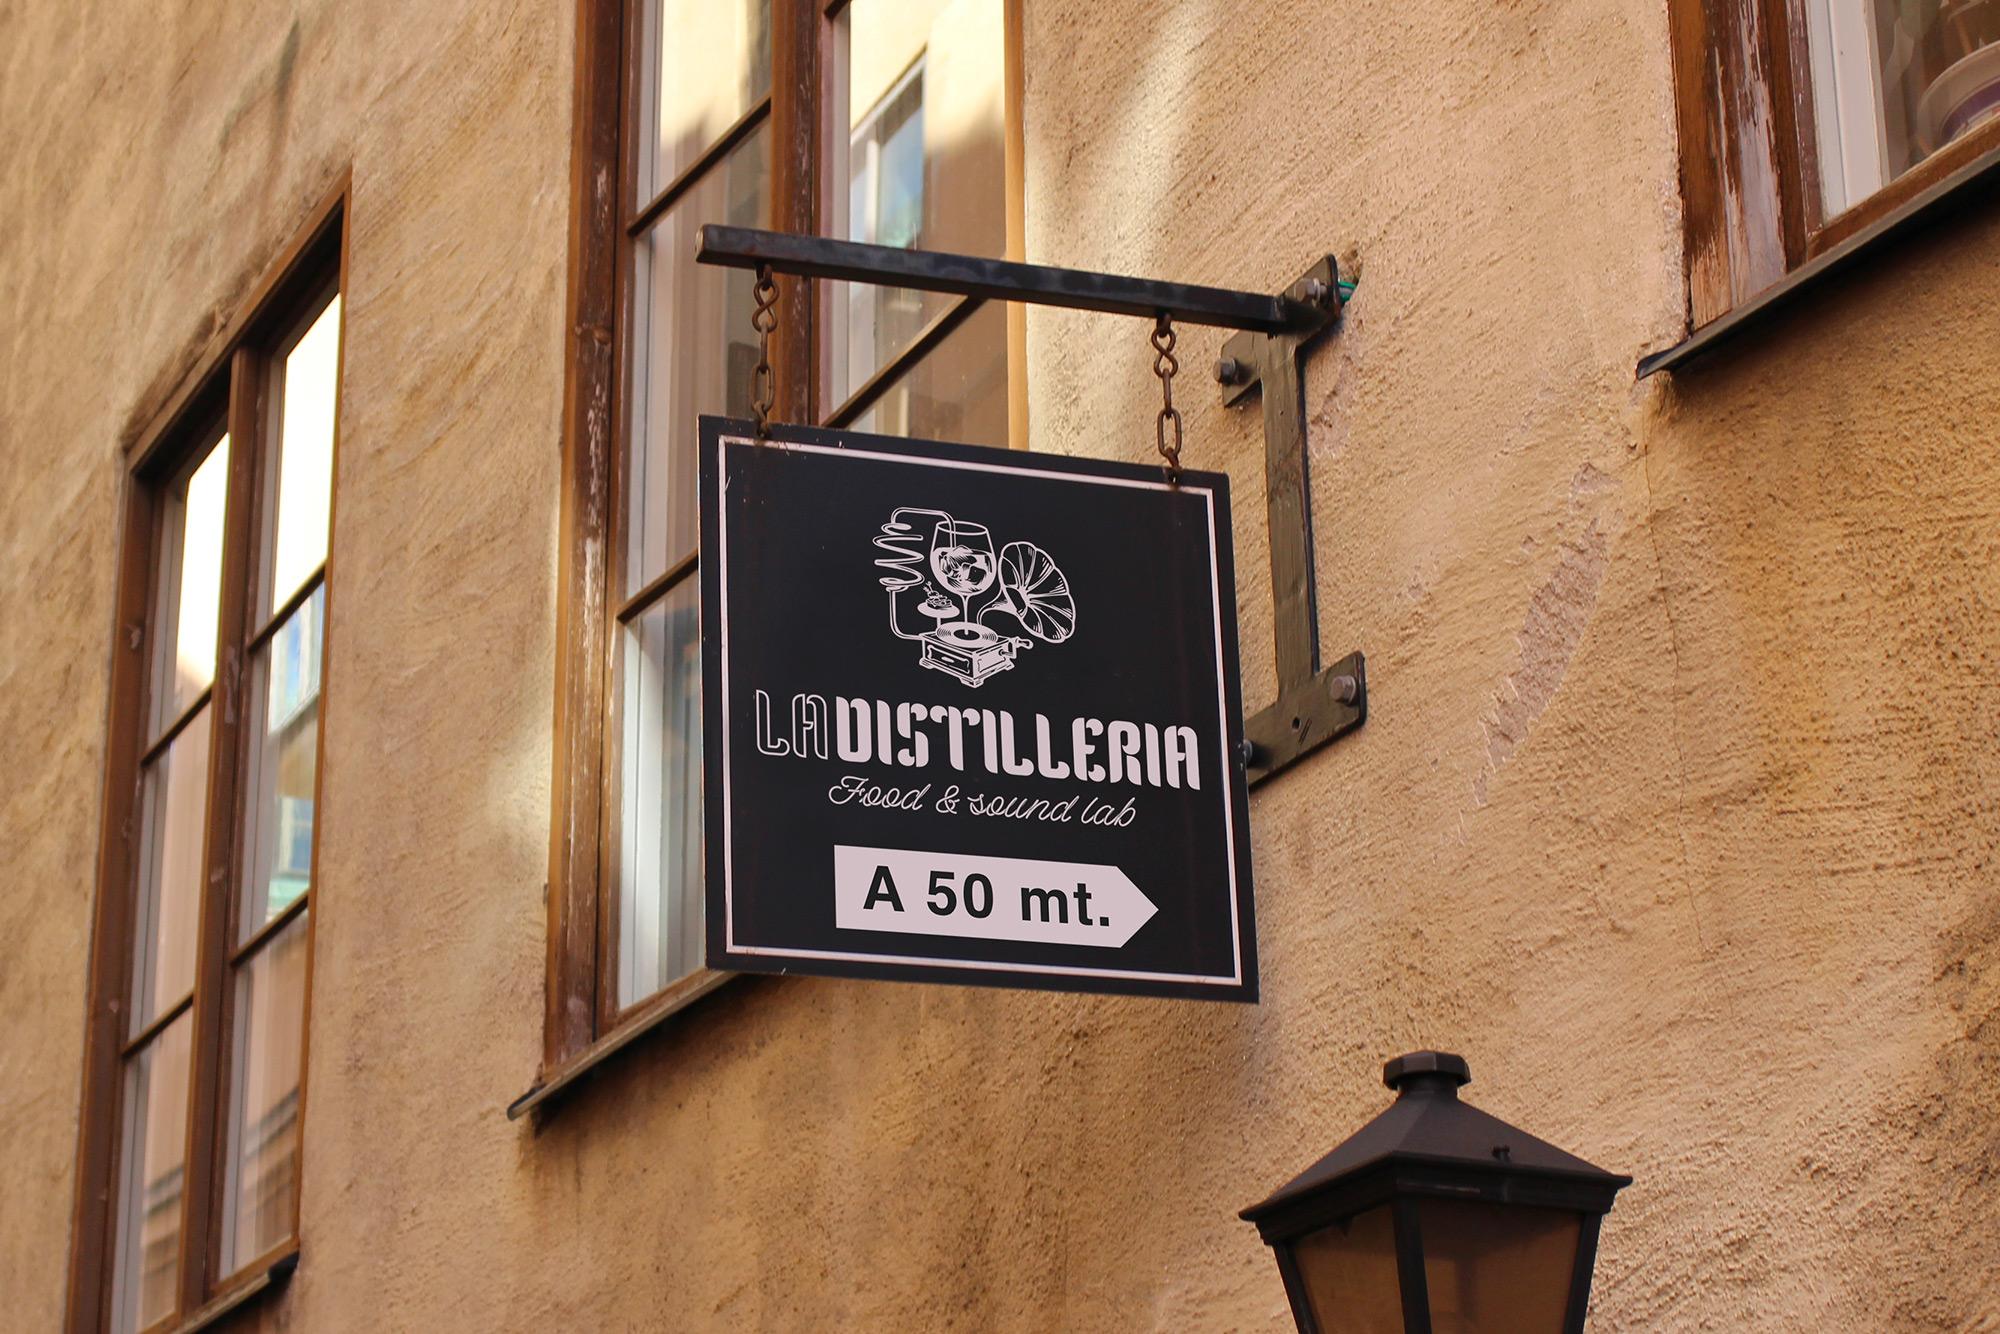 La Distilleria - Food & Sound Lab - logo, branding - img 4